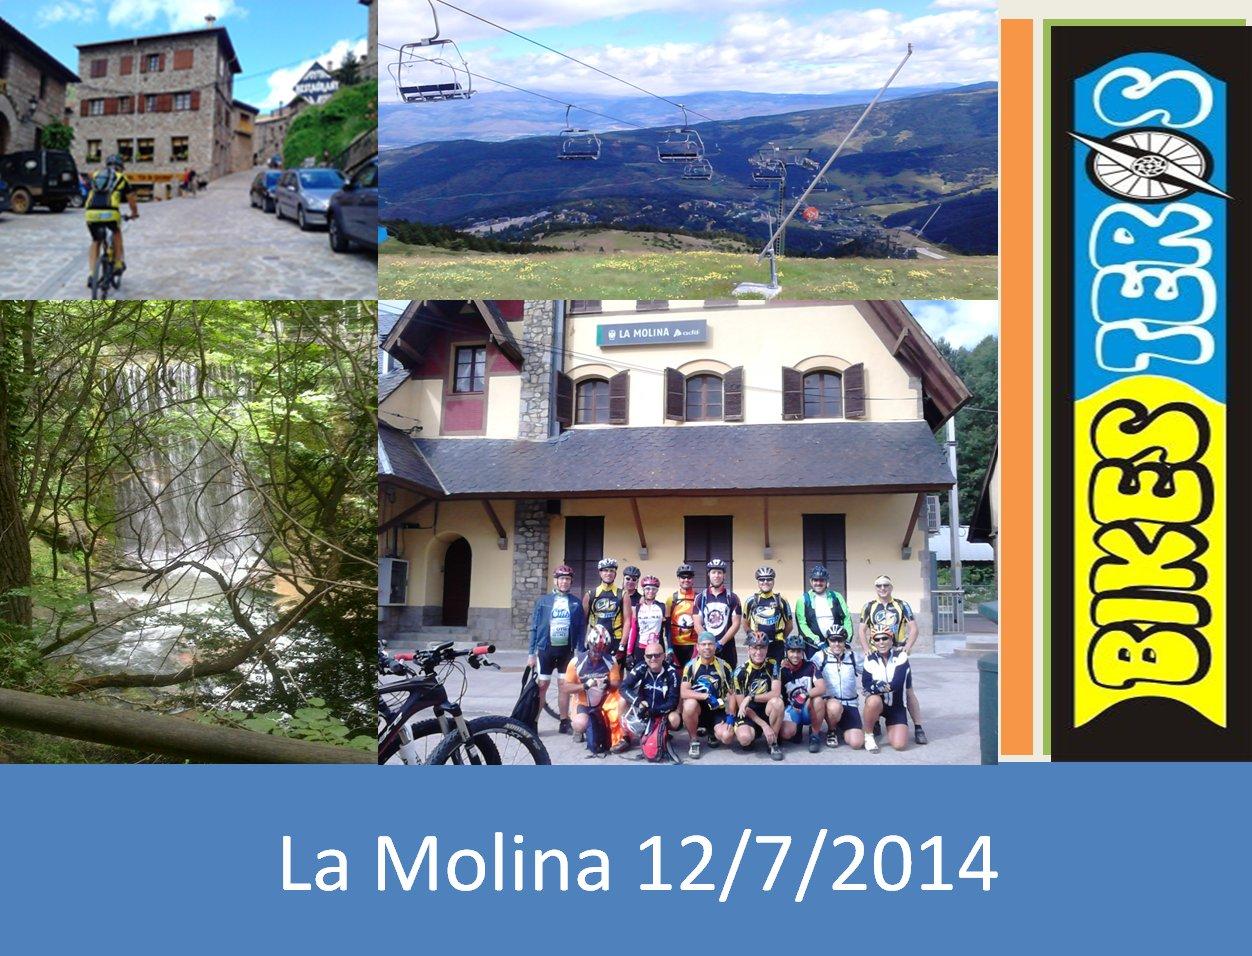 http://www.youblisher.com/p/934887-LA-MOLINA-2014/